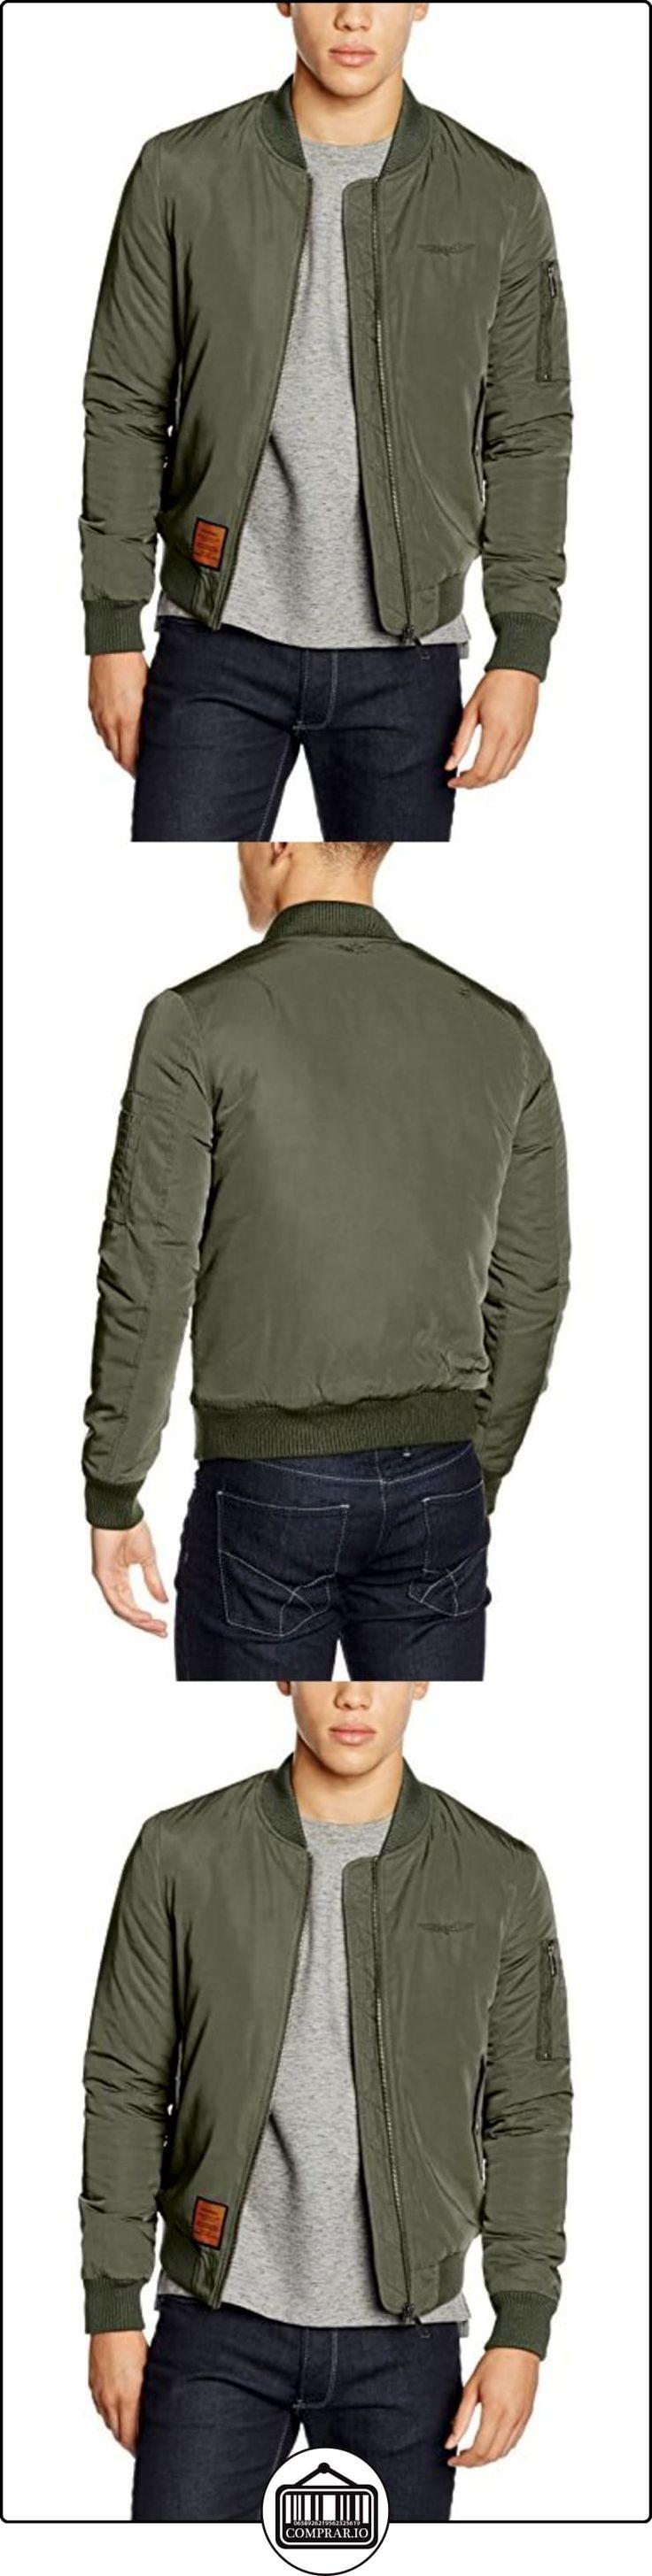 Bombers Original M, Chaqueta para Hombre, verde (kaki 3), Medium  ✿ Abrigos y chaquetas ✿